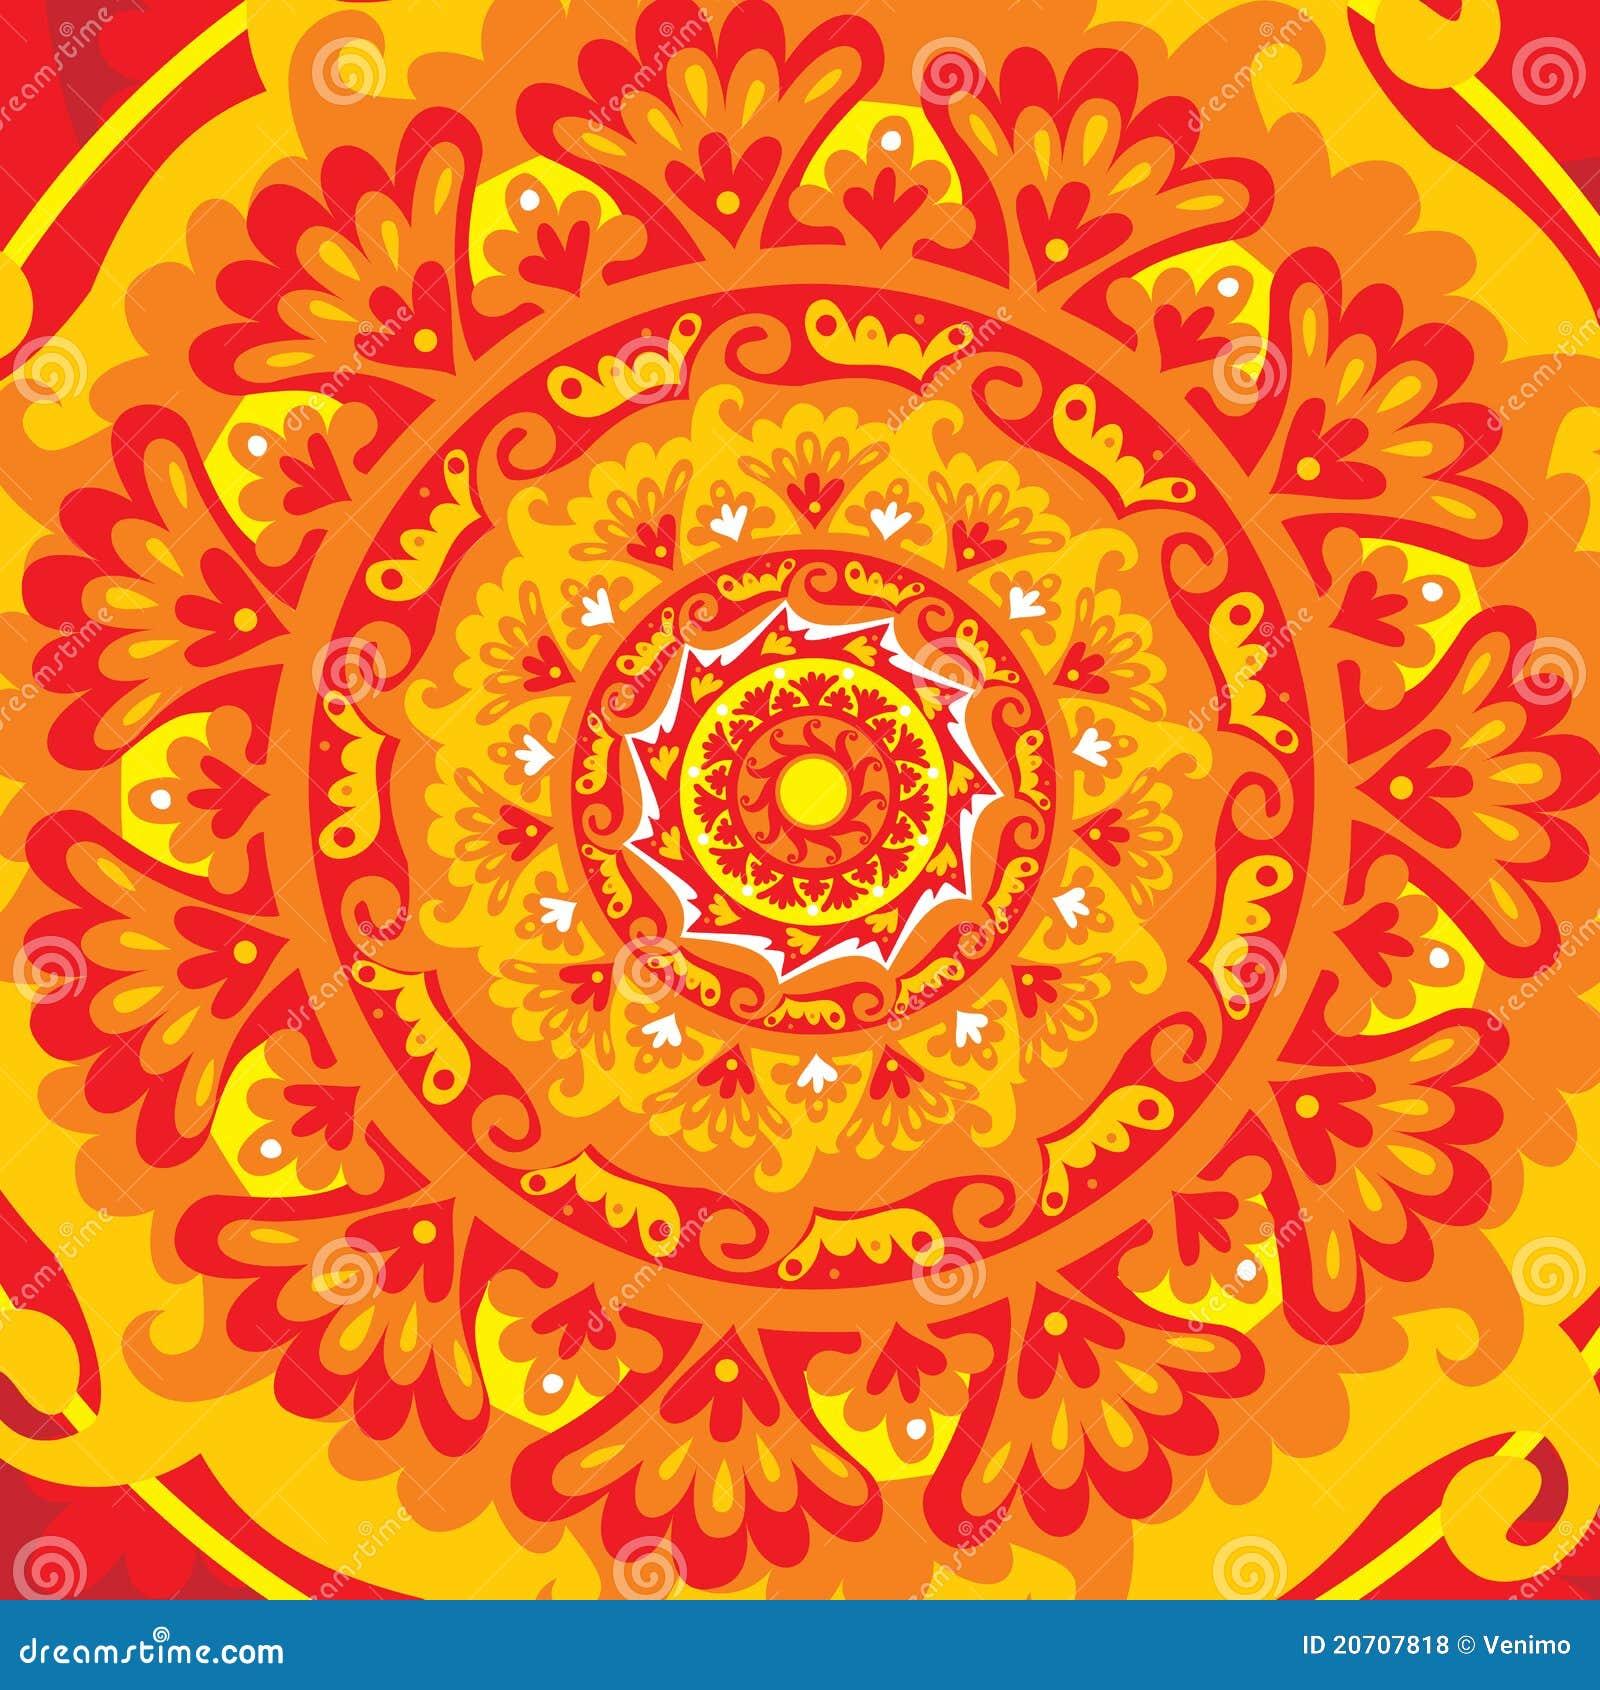 Sun Mandala Royalty Free Stock Photos Image 20707818